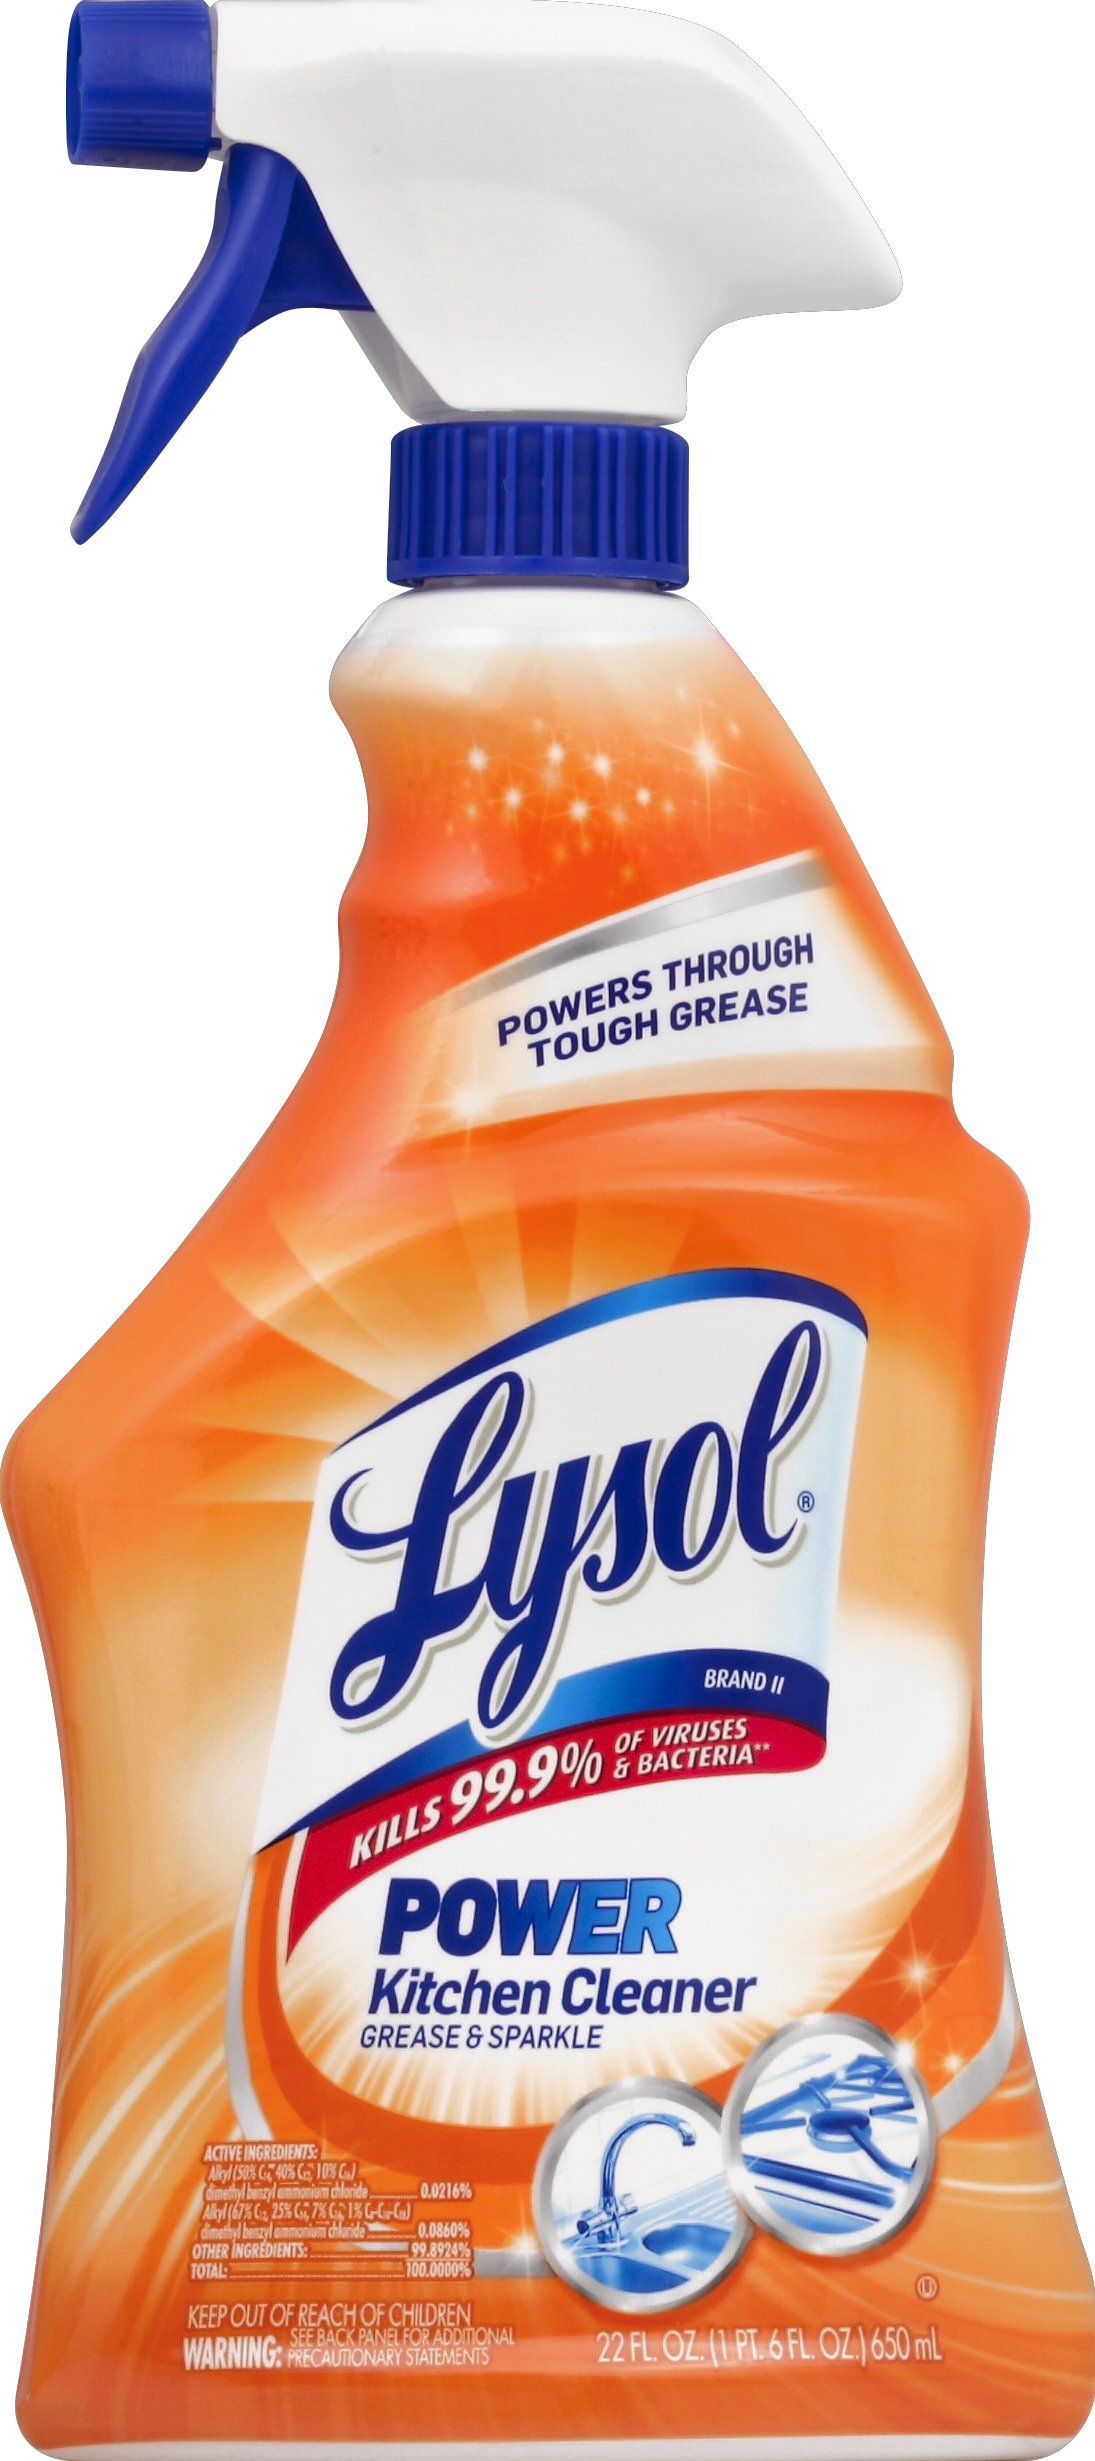 Lysol Power Kitchen Cleaner, Citrus Scent, 22 oz, Case of 12